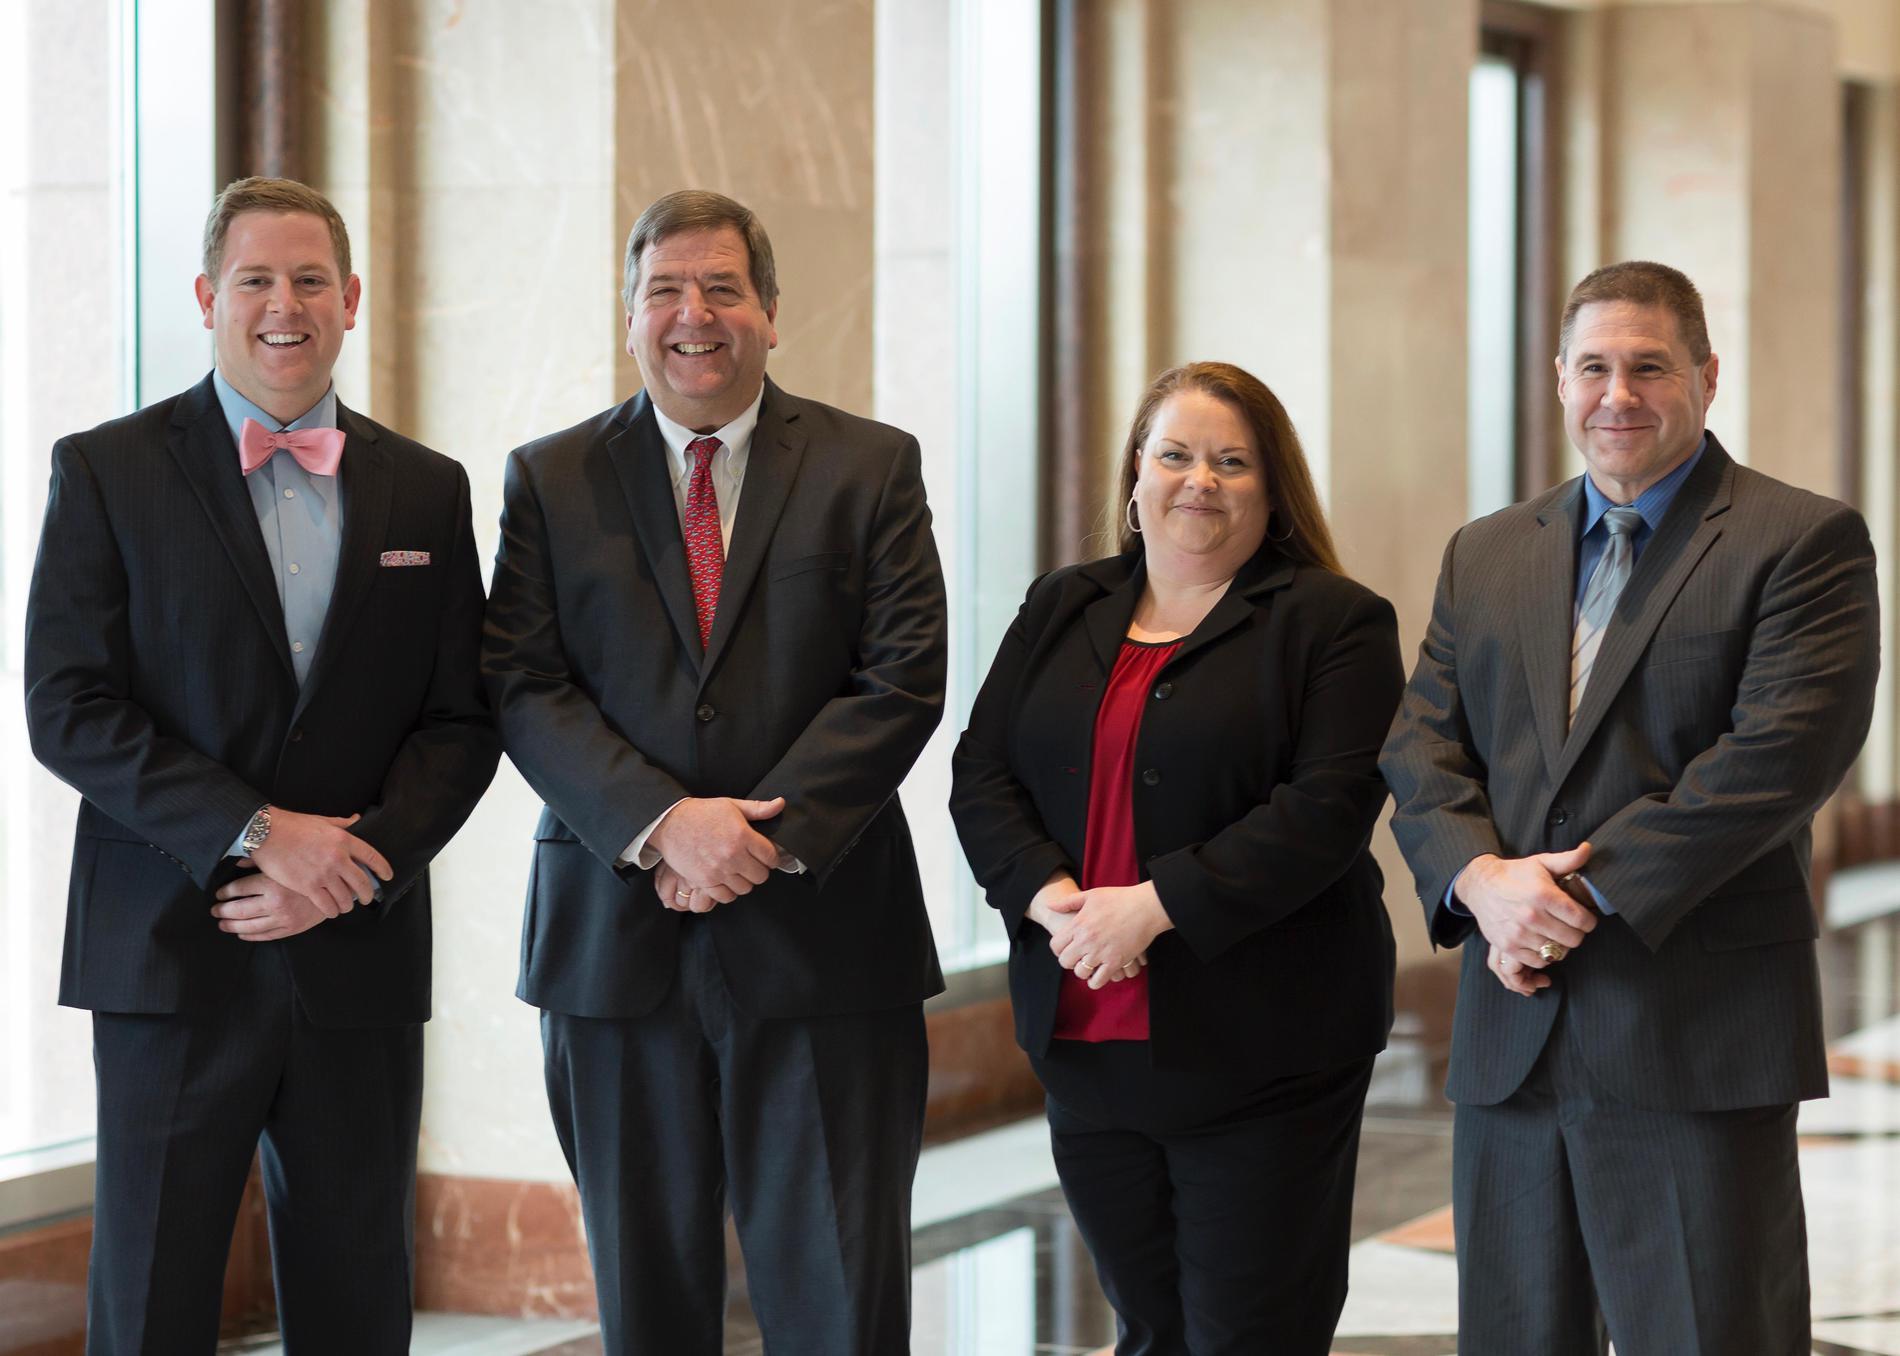 Emerson-Loveless Group | Winston Salem, NC | Morgan Stanley Wealth